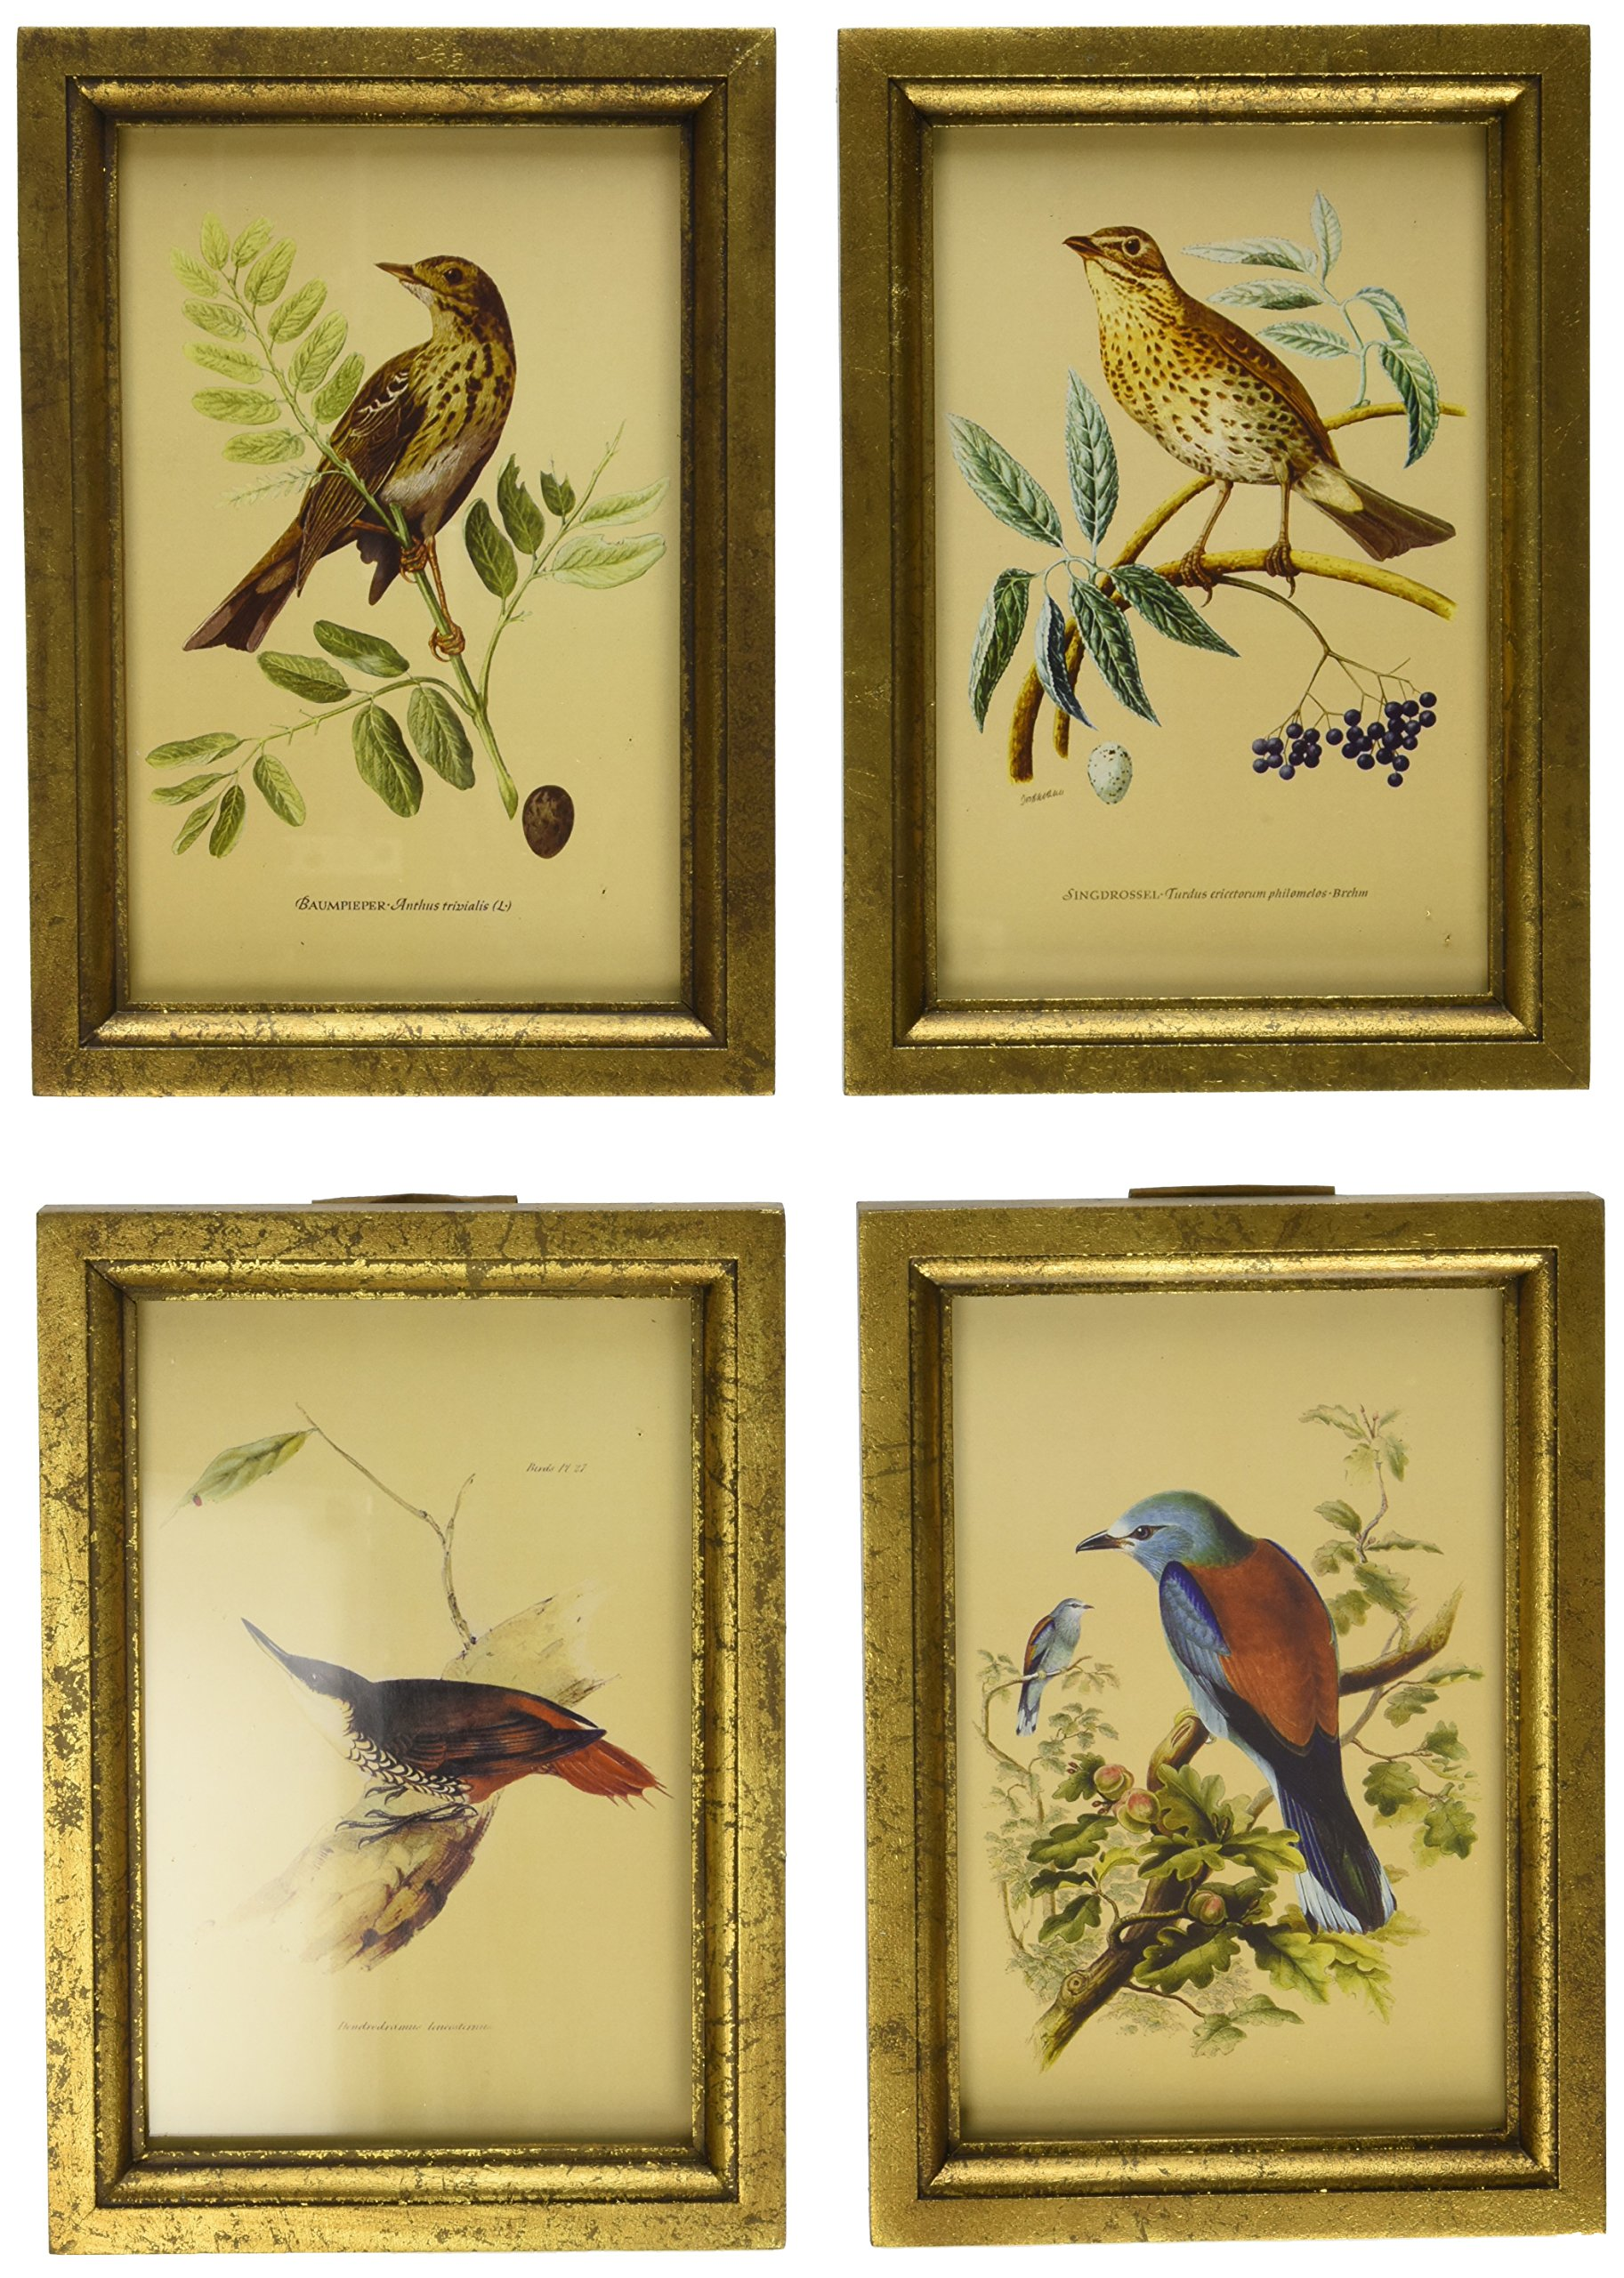 Imax 16125-4 Wooden Bird Plaques, Set Of 4